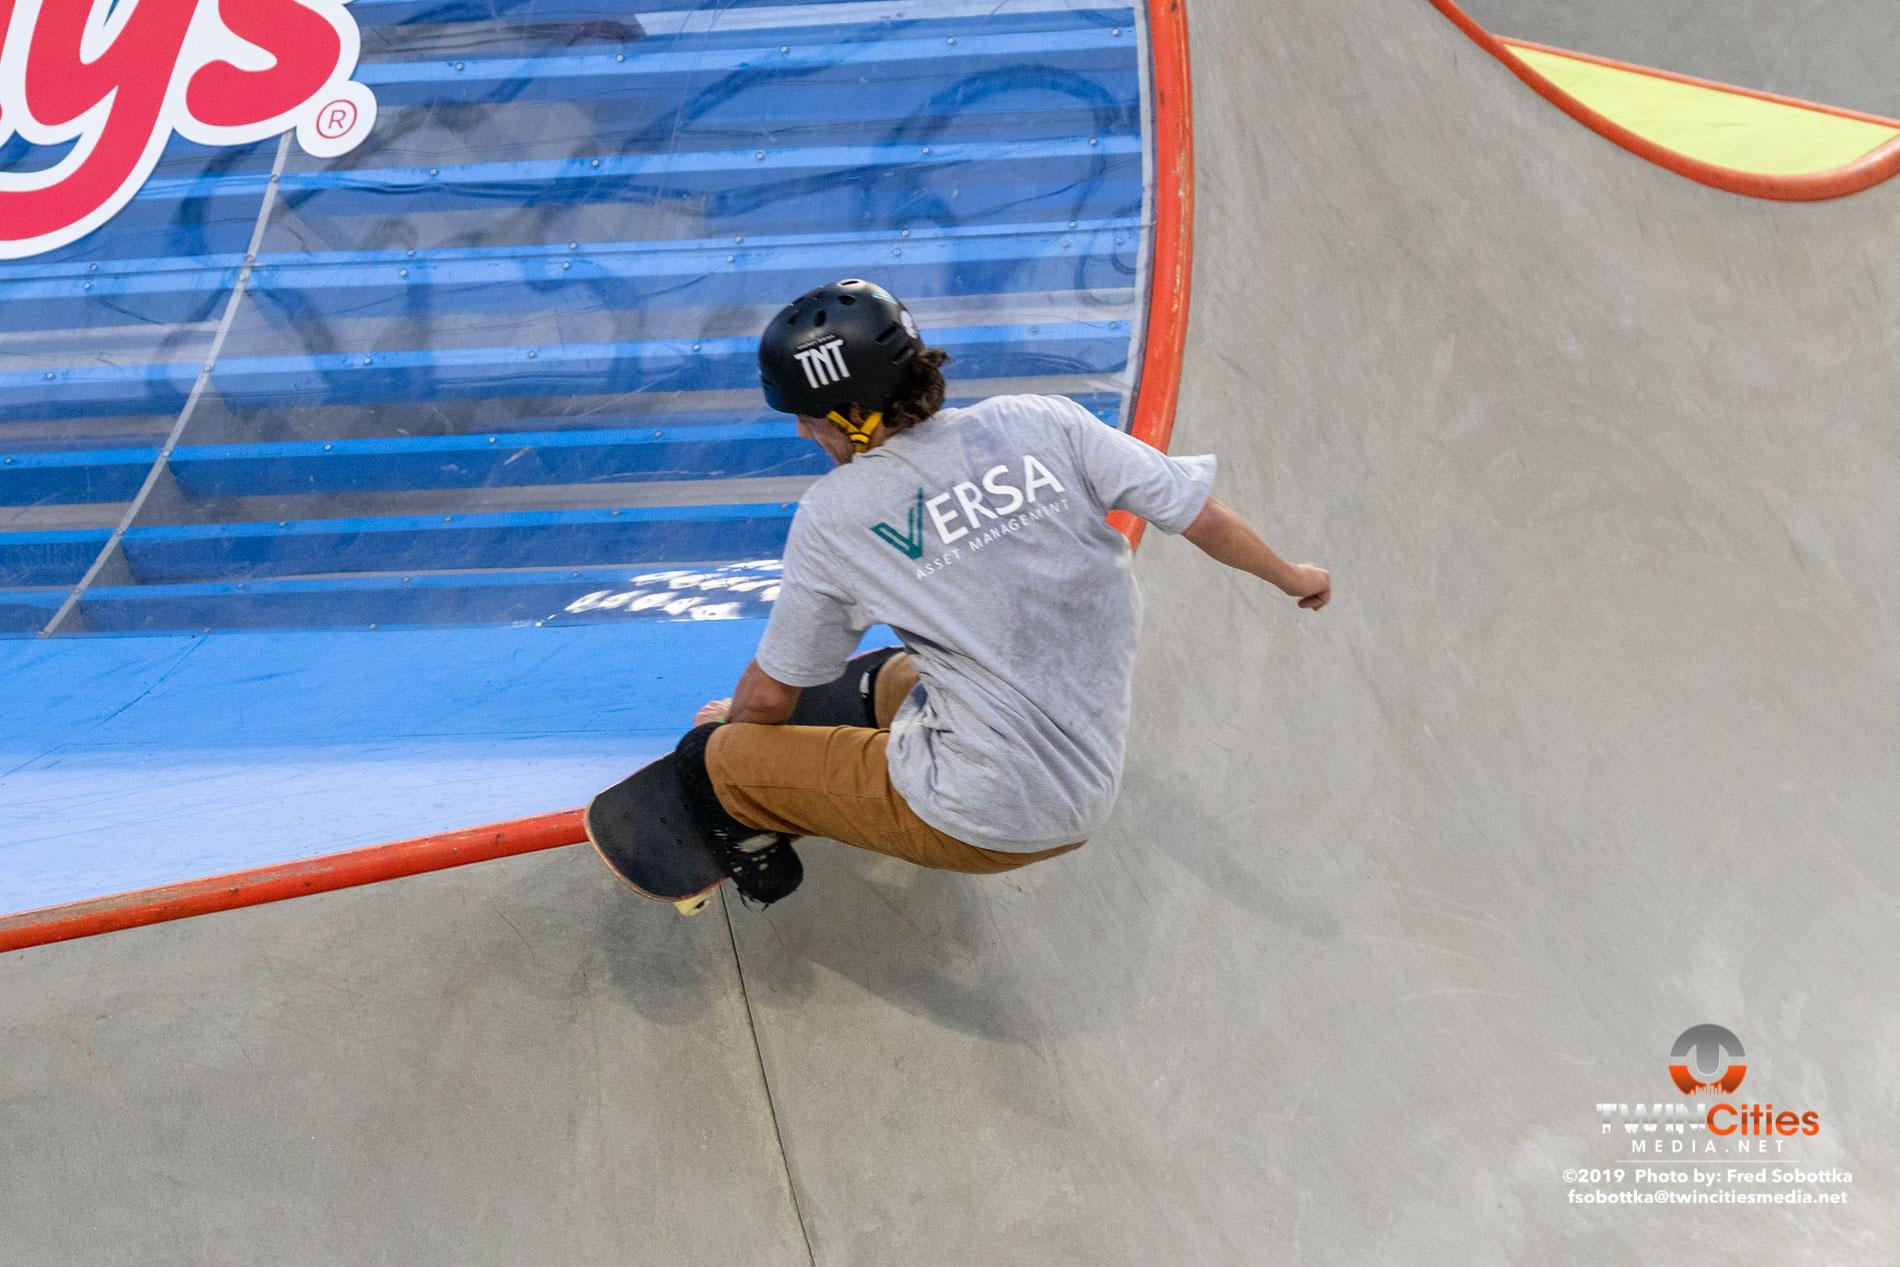 Adaptive-Skateboard-Park-02